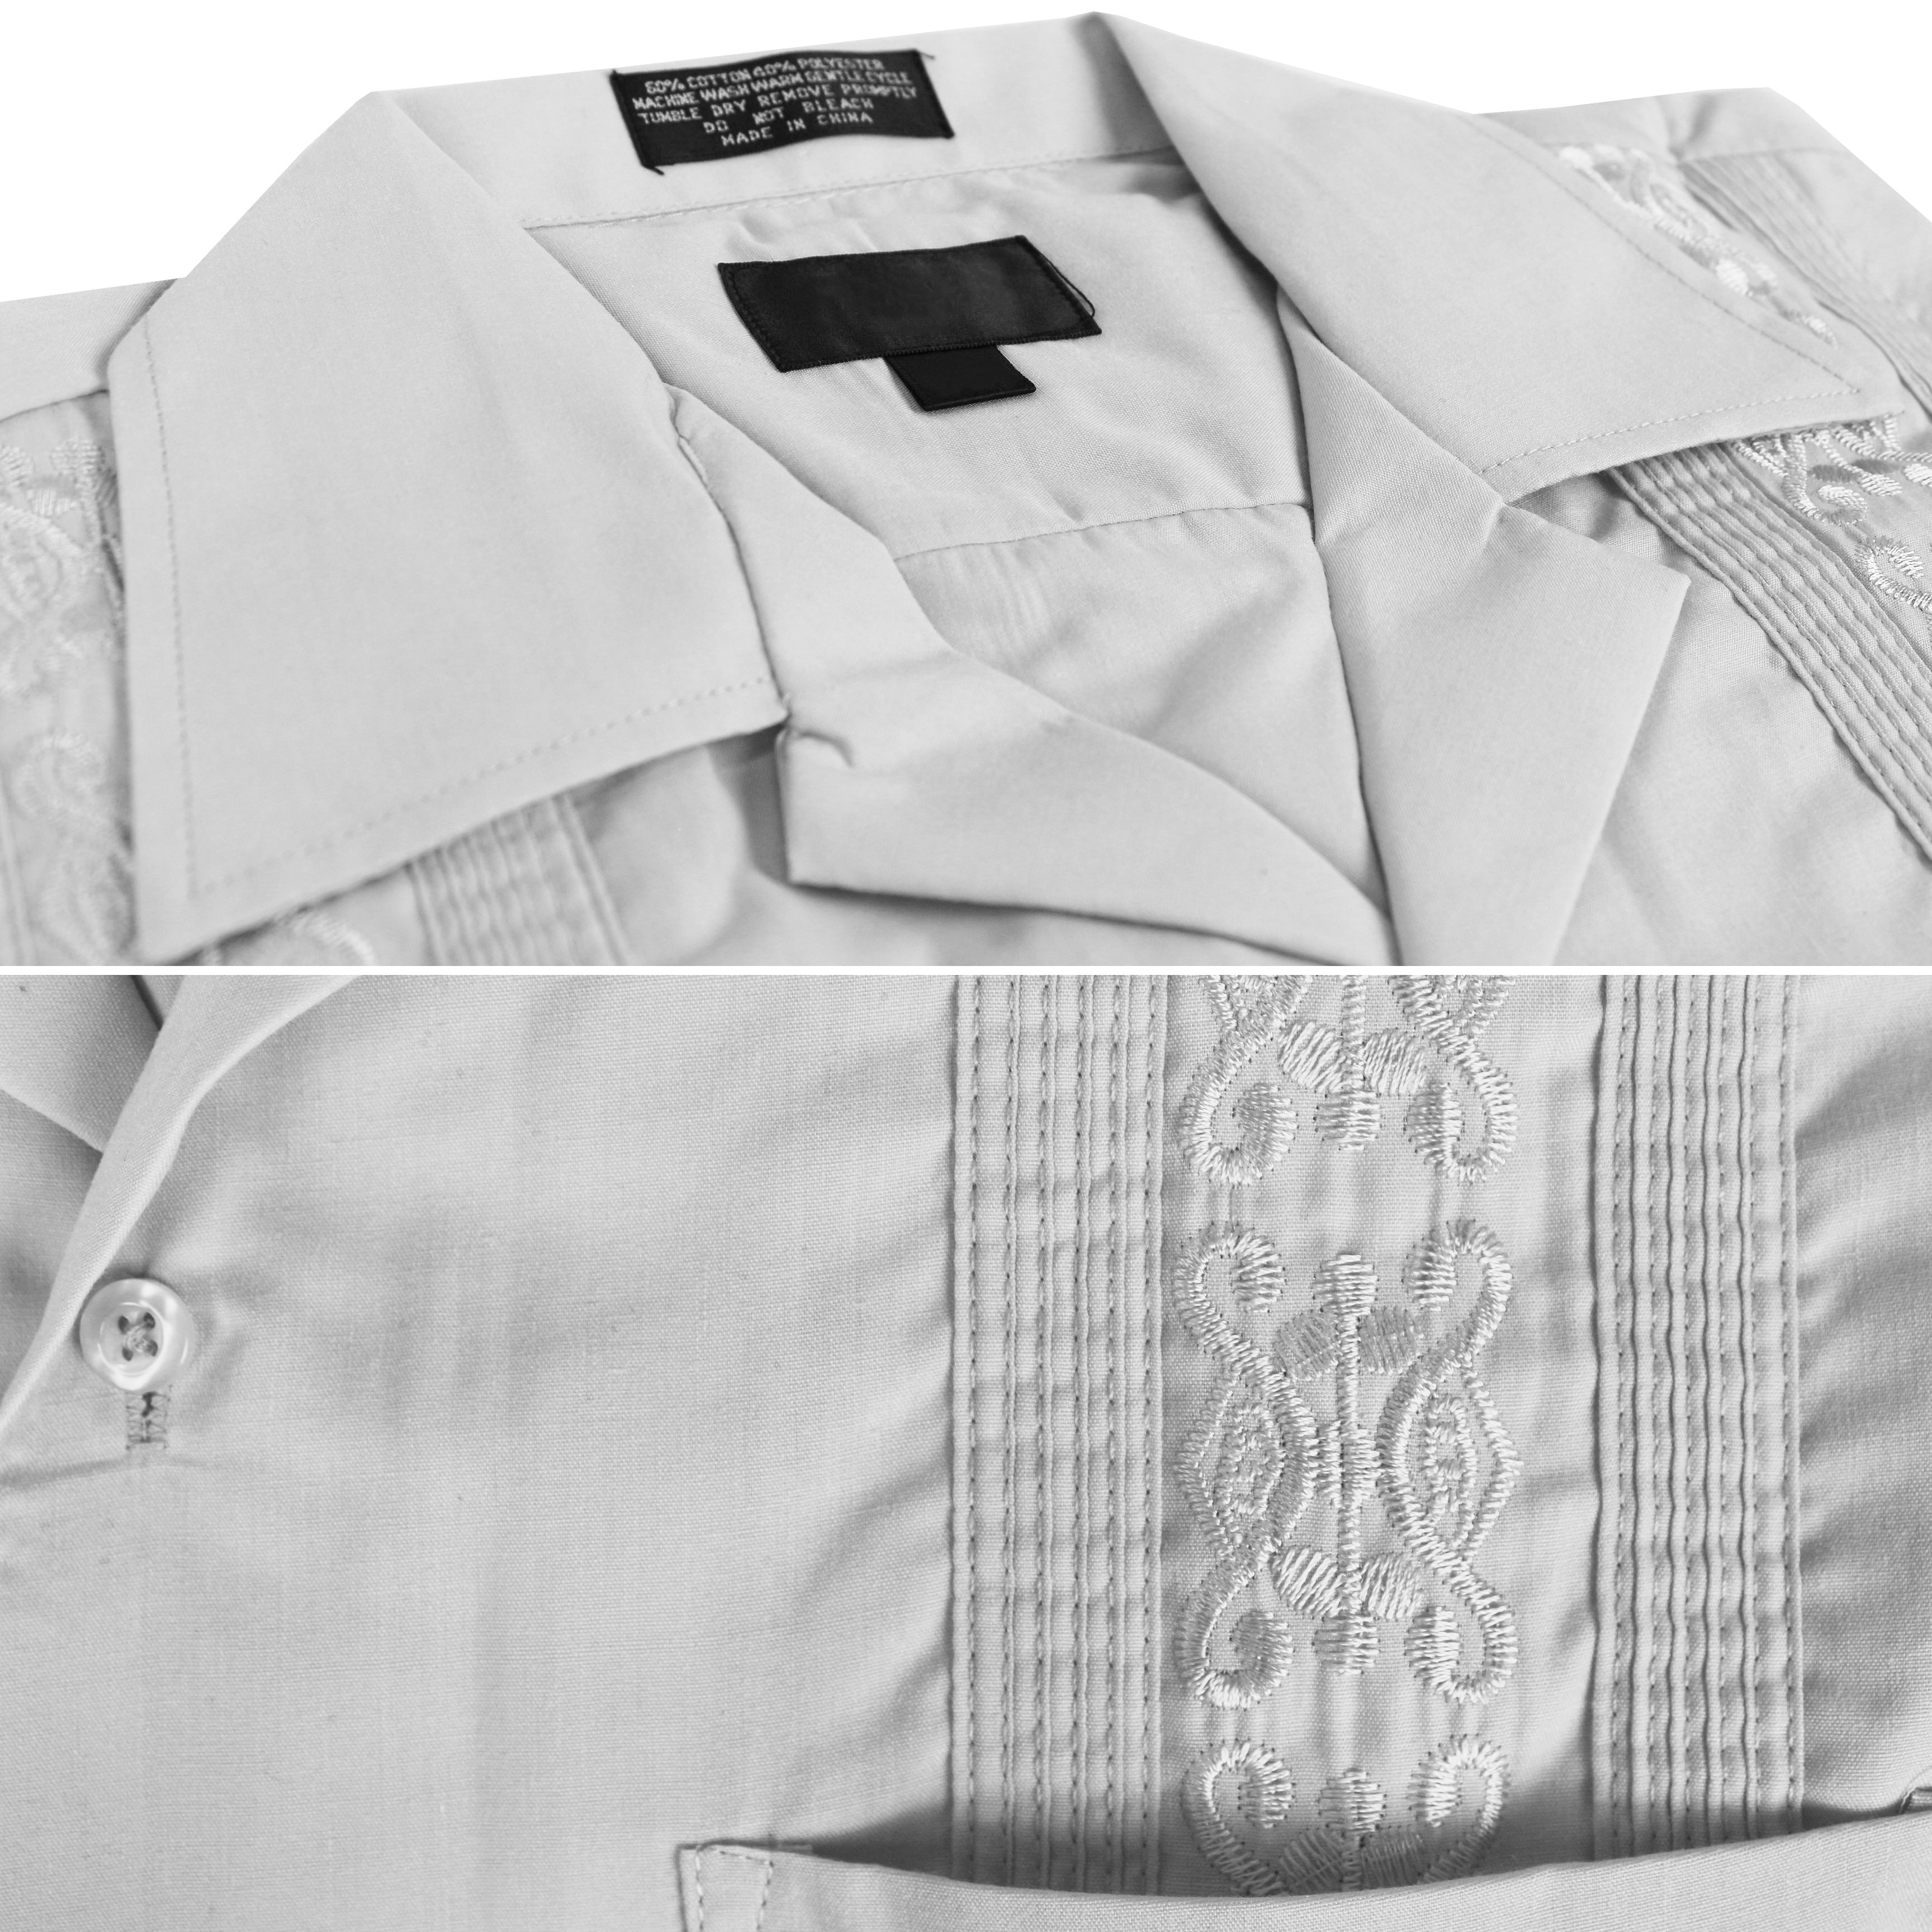 8bfac23948 vkwear Men s Guayabera Cuban Beach Wedding Casual Short Sleeve Dress ...